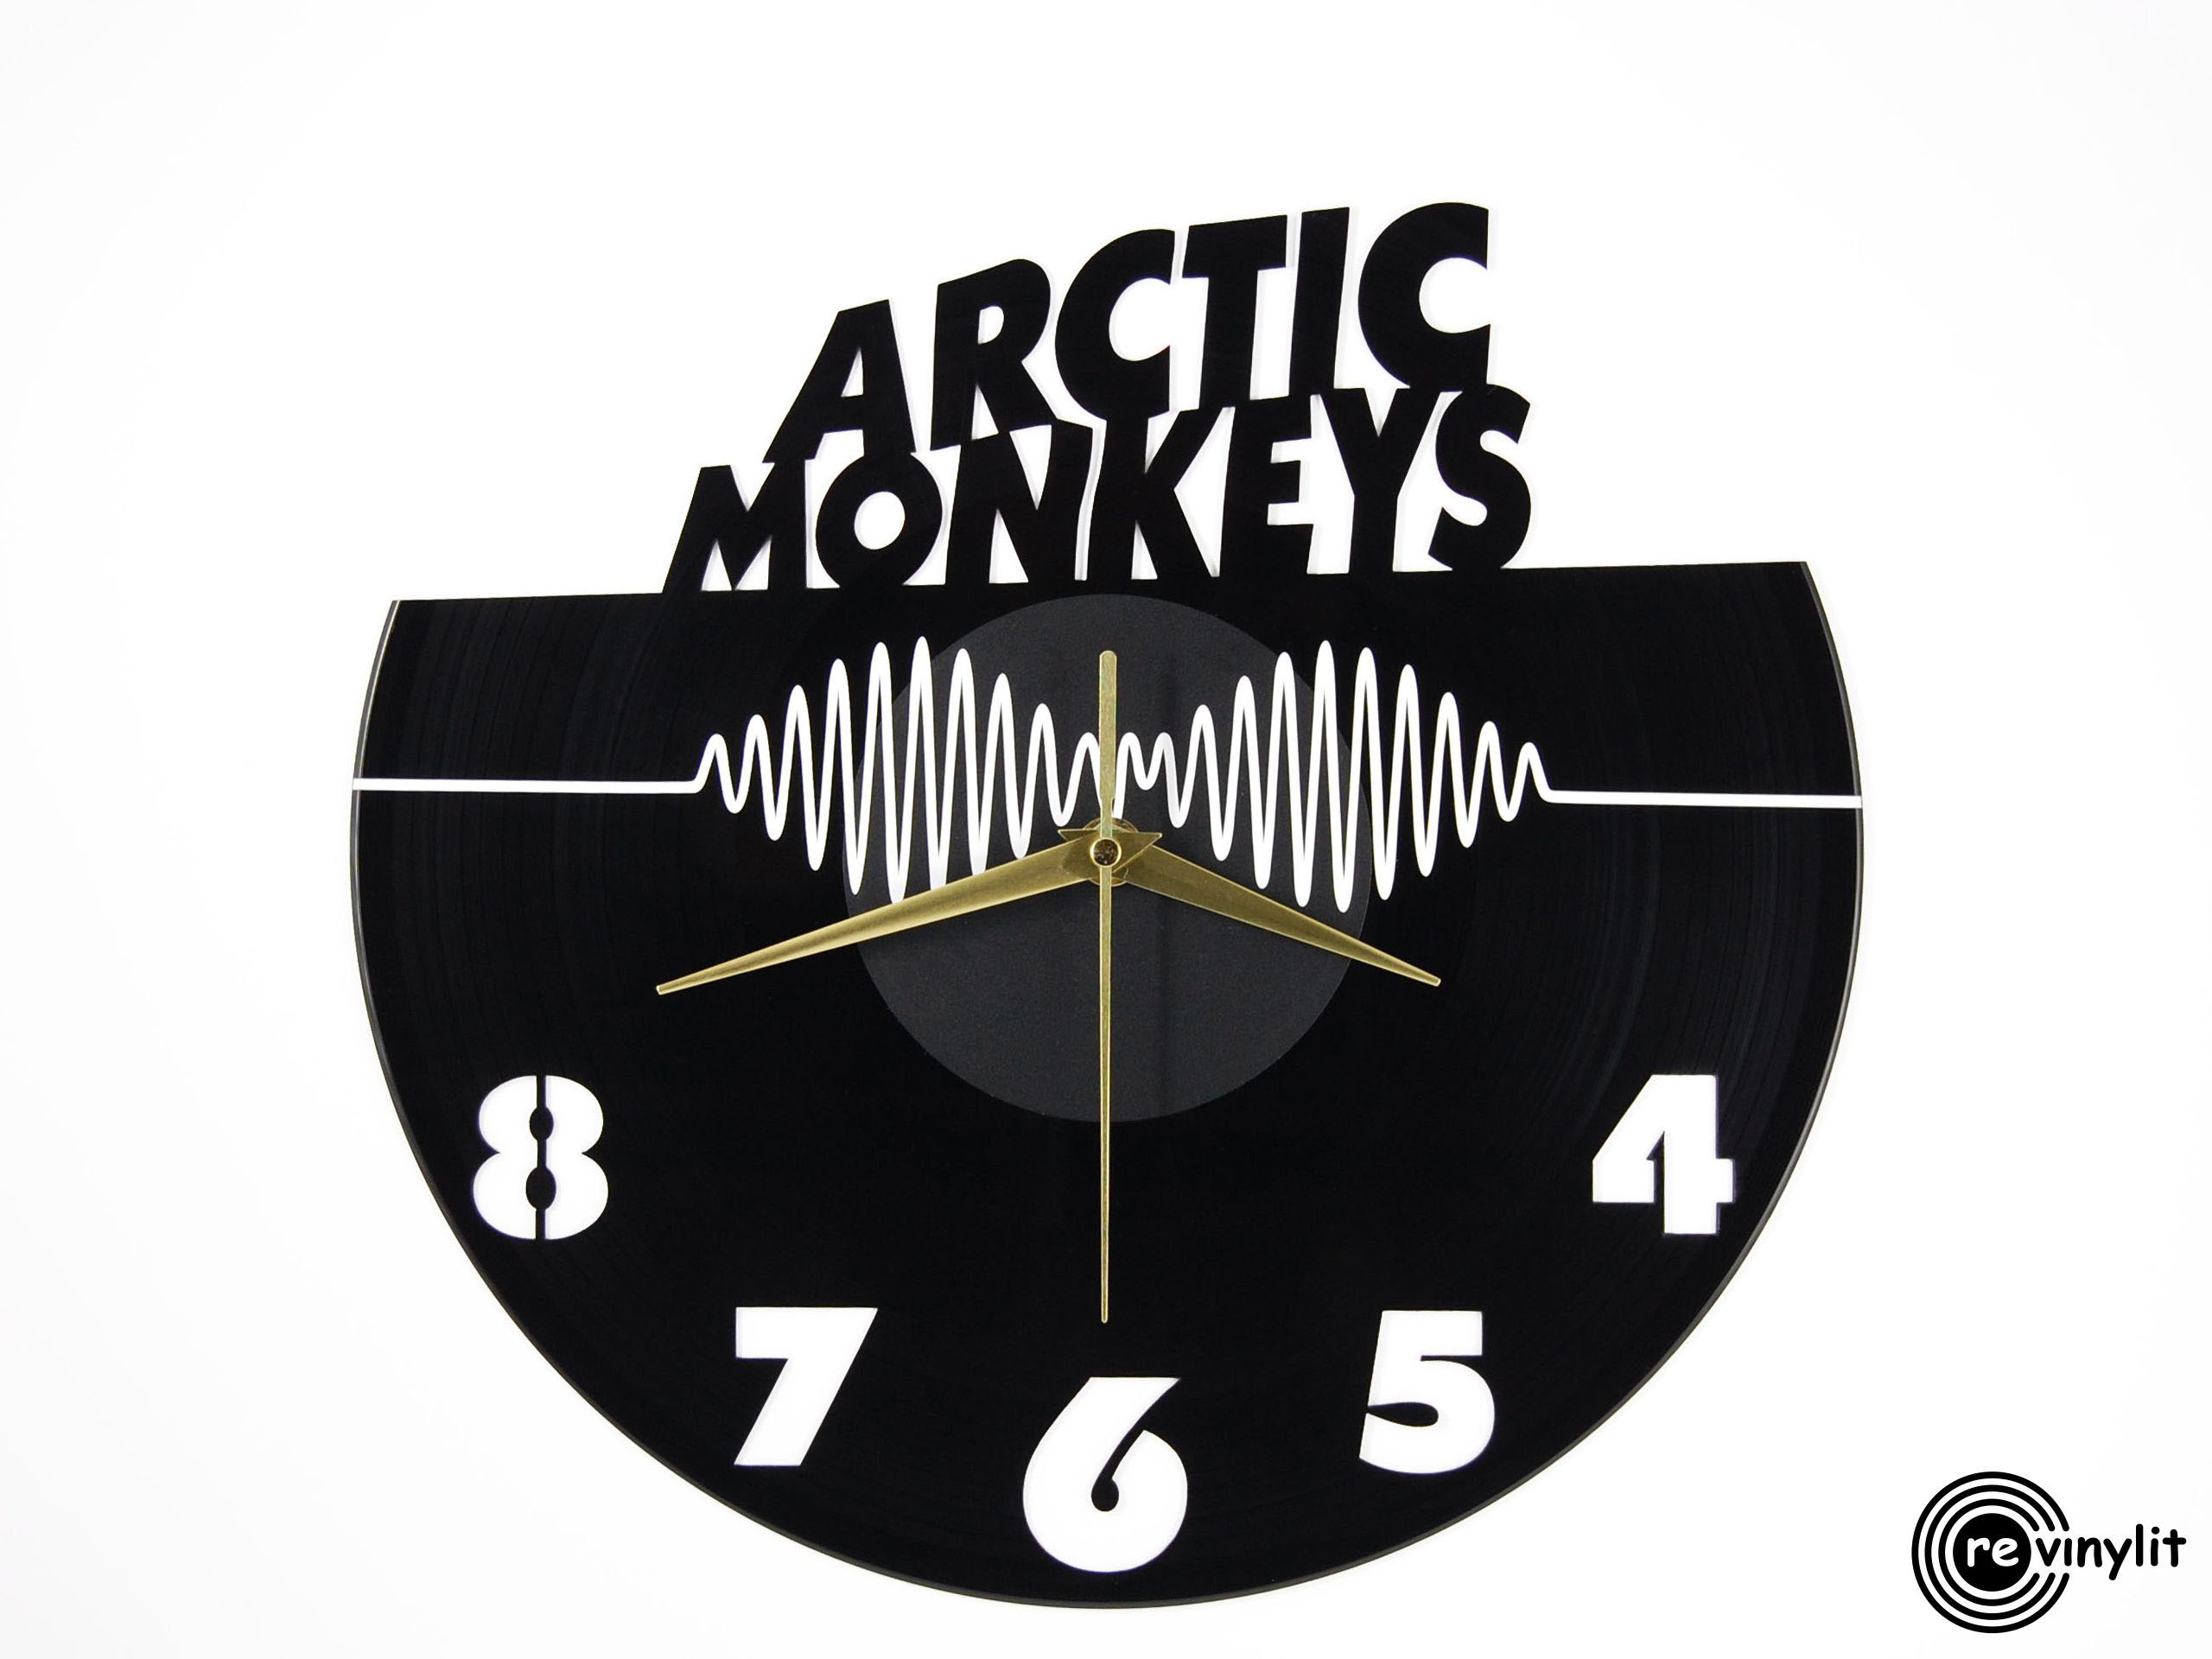 Arctic Monkeys Vinyl Record Clock Revinylit On Storenvy